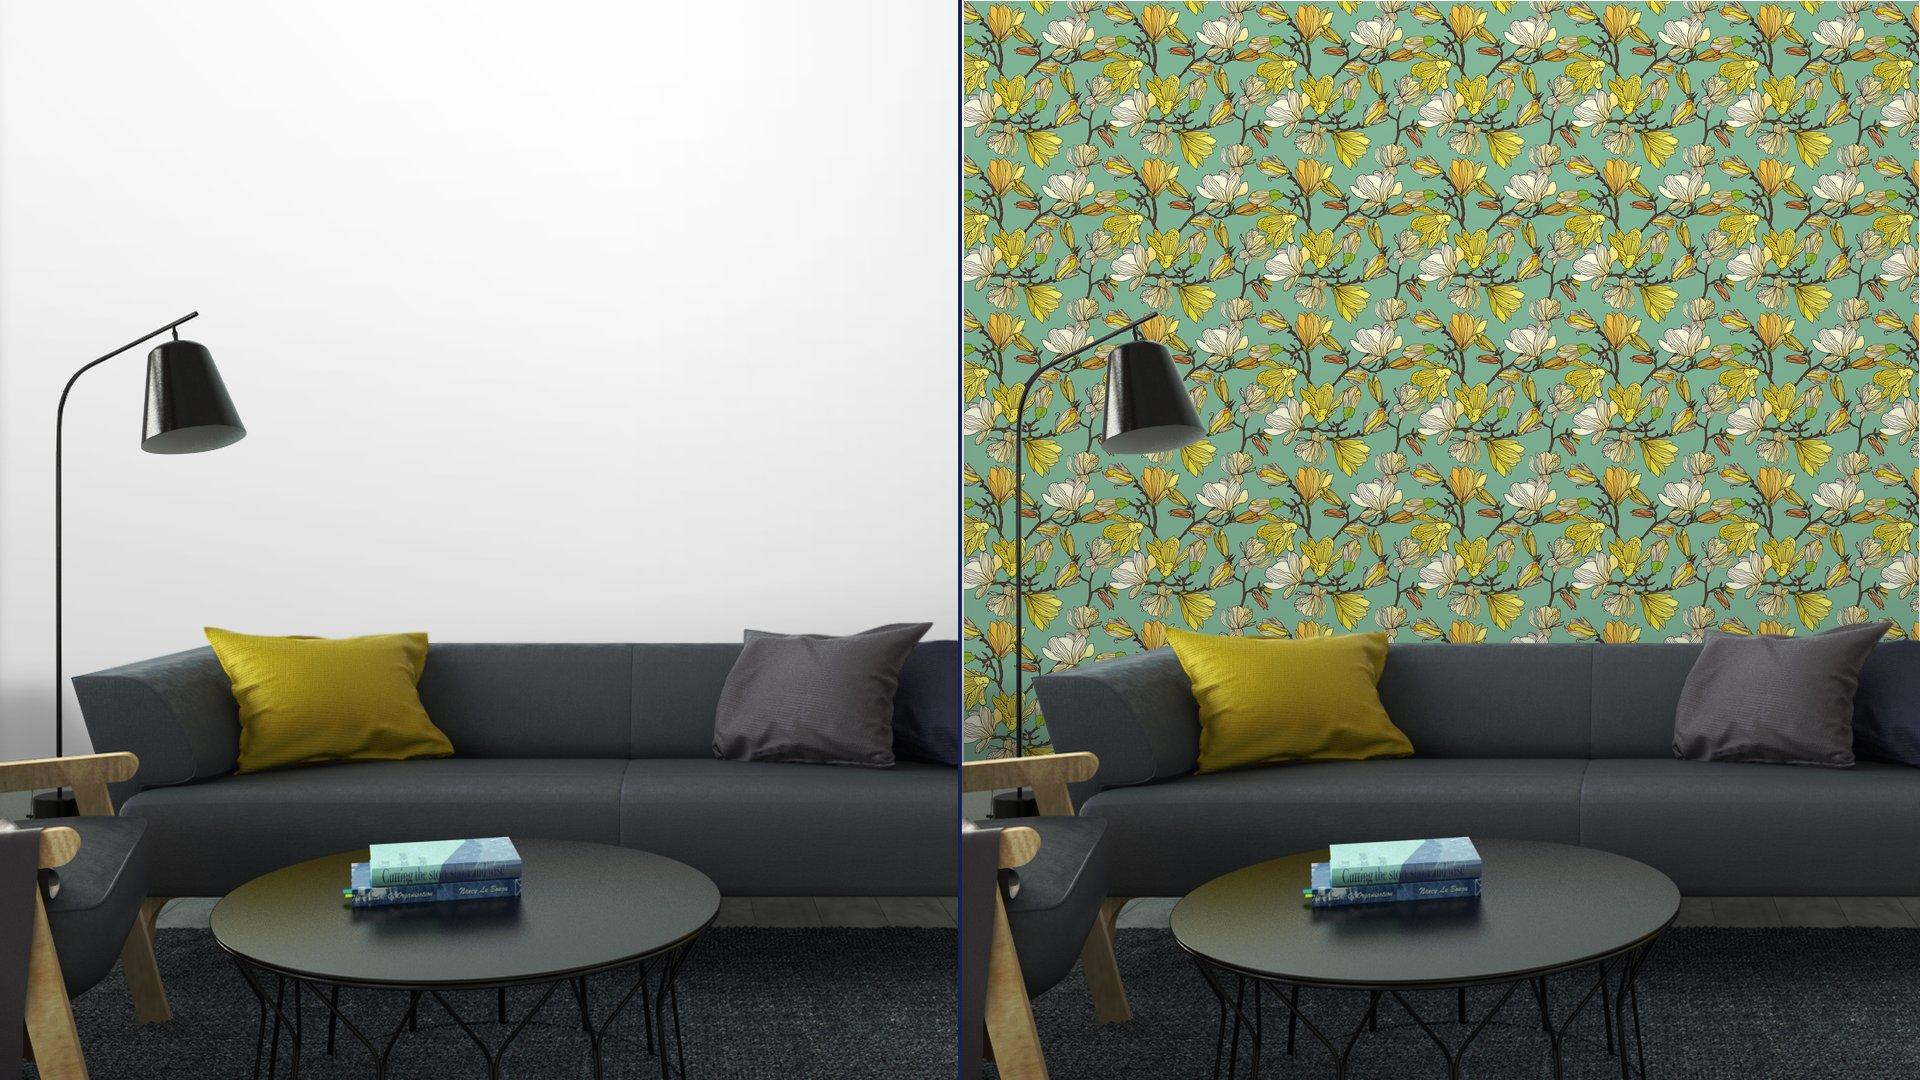 Fotomurales mexico papeles pintados textura floral sin fisuras 7 - Papel Tapiz Patrón Floral en Fondo Azul Tipo Vintage 01